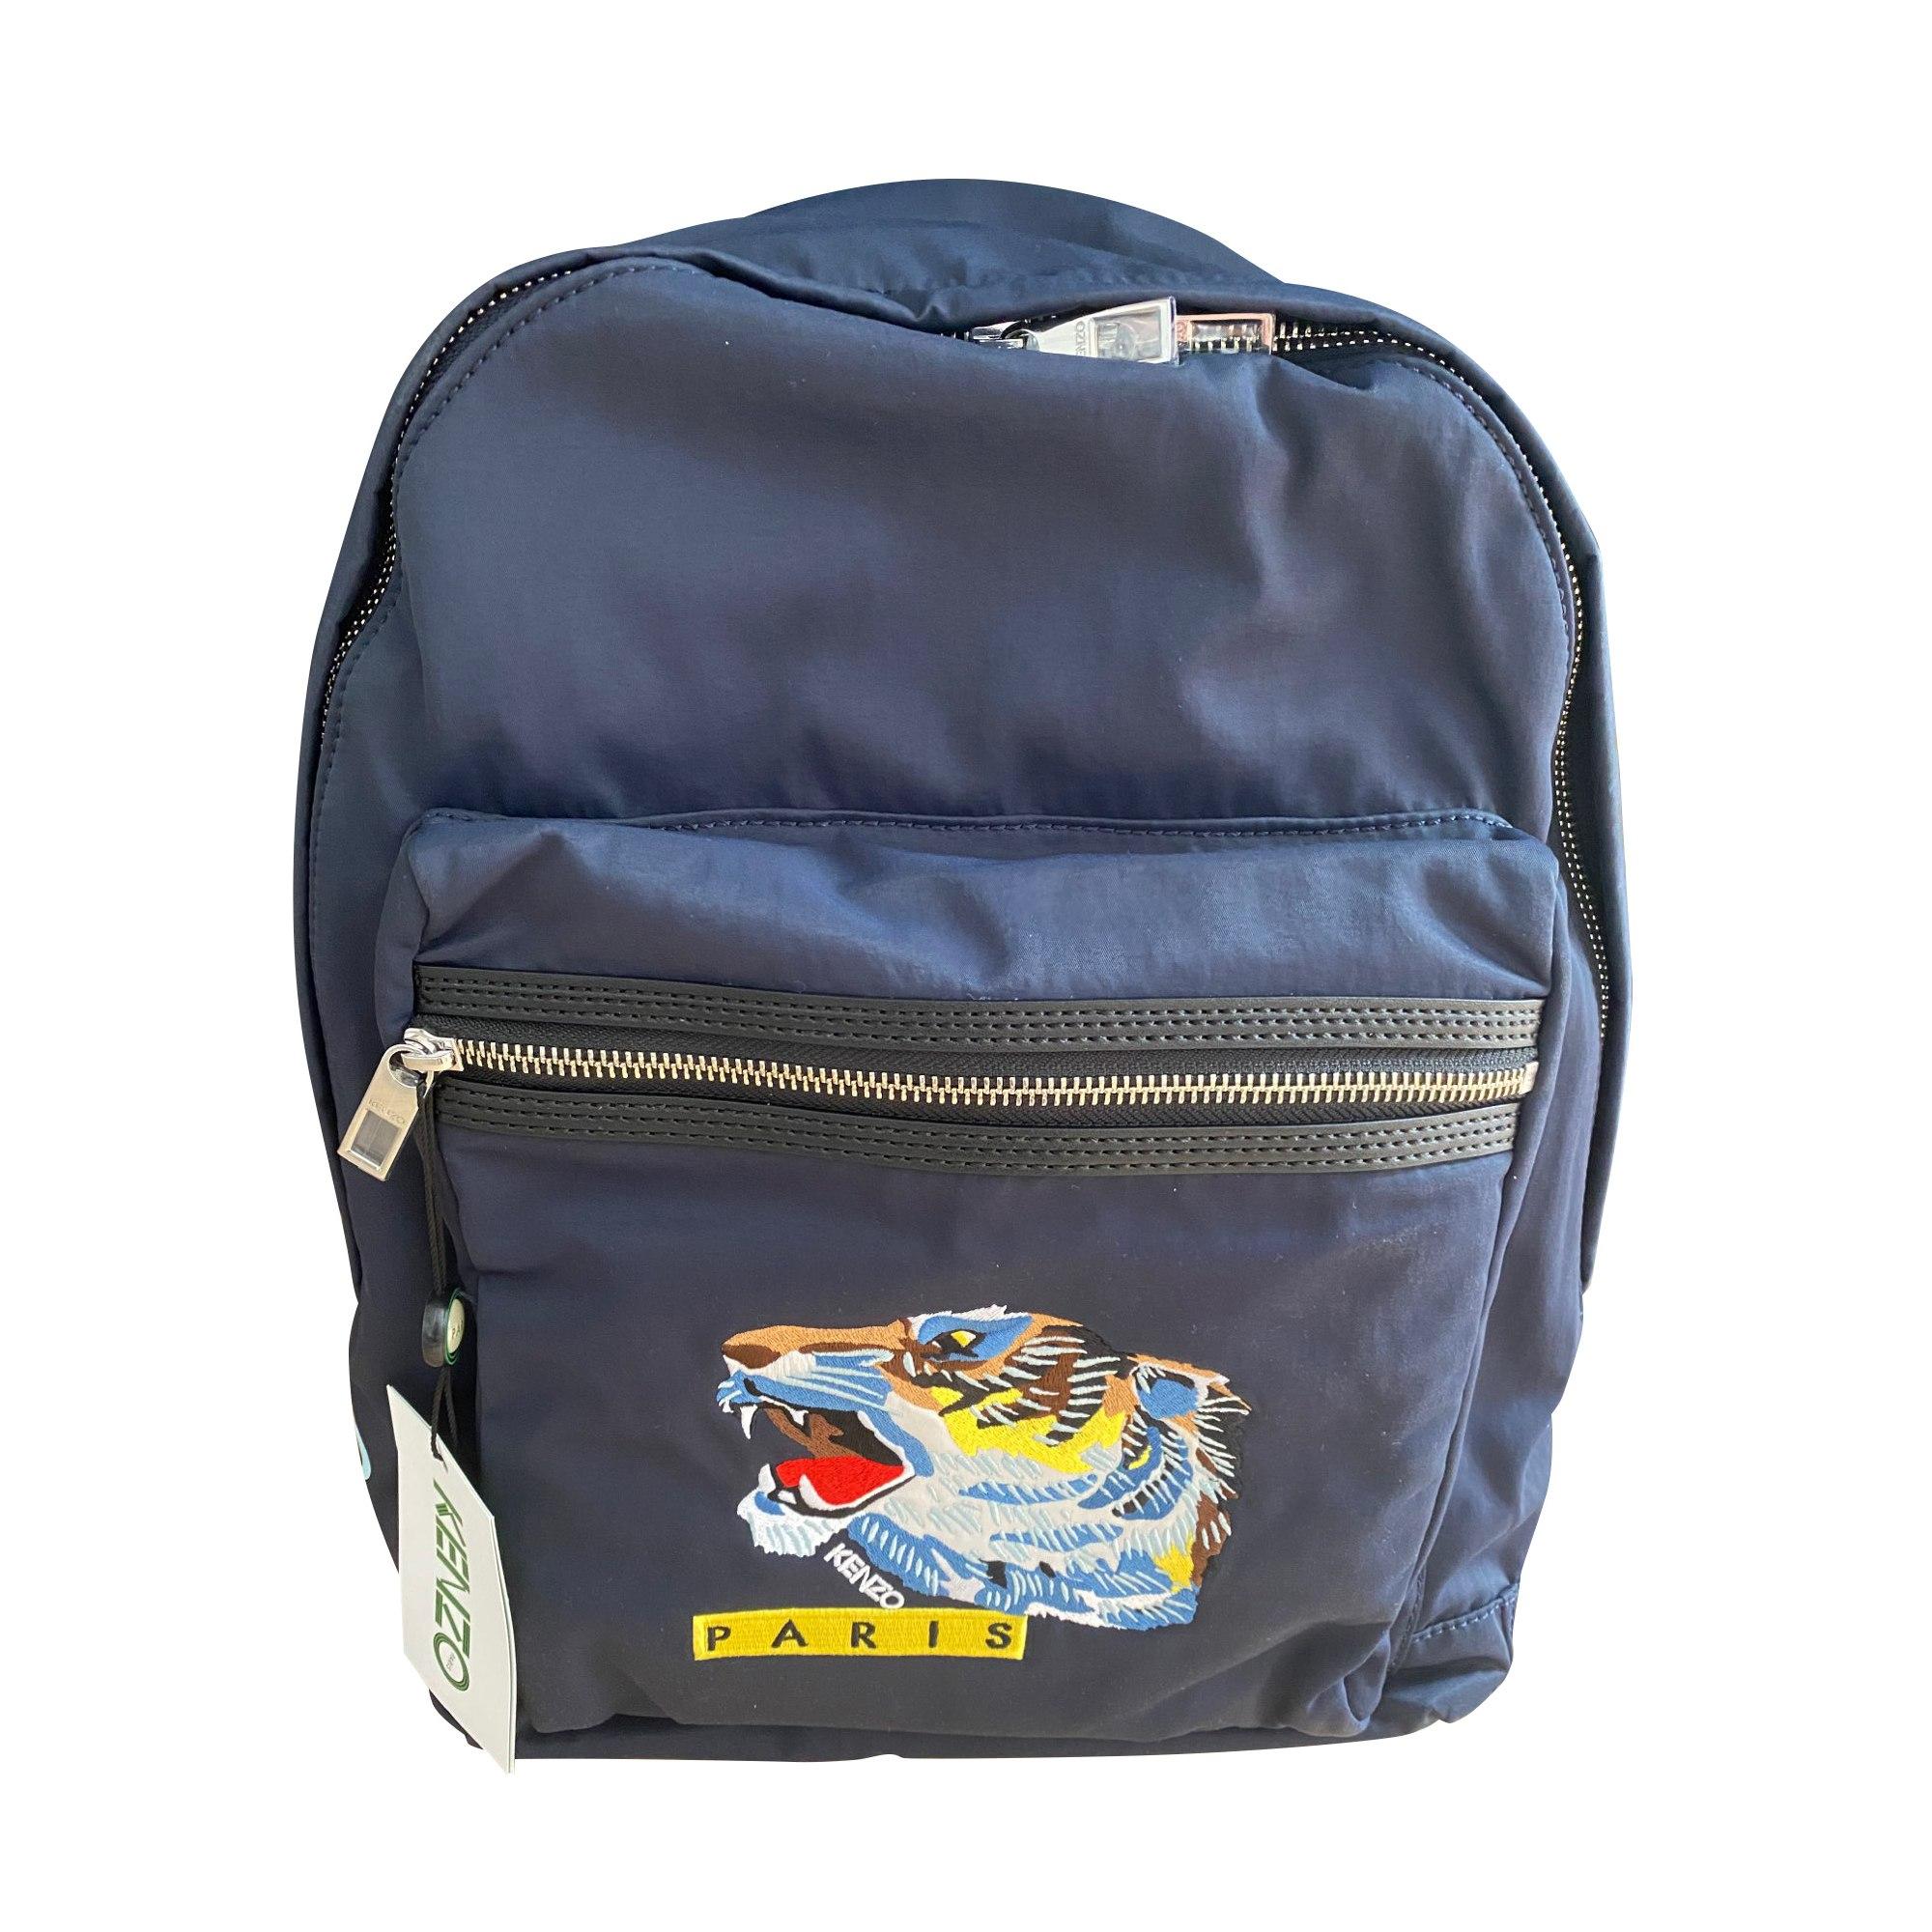 Backpack KENZO Blue, navy, turquoise